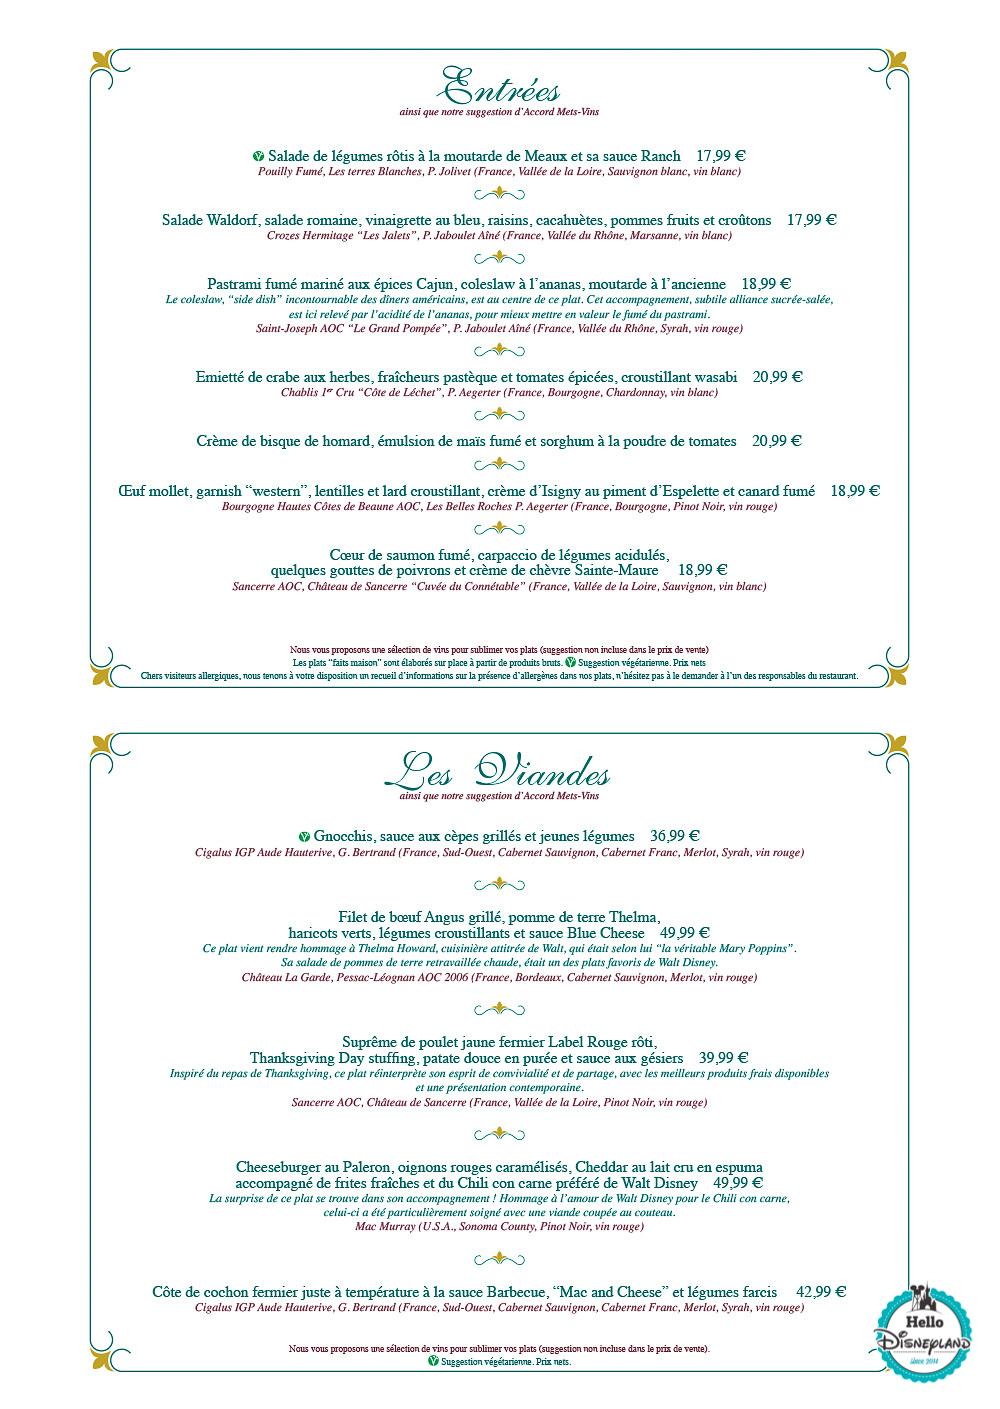 Menus Walt's – an American Restaurant Disneyland Paris